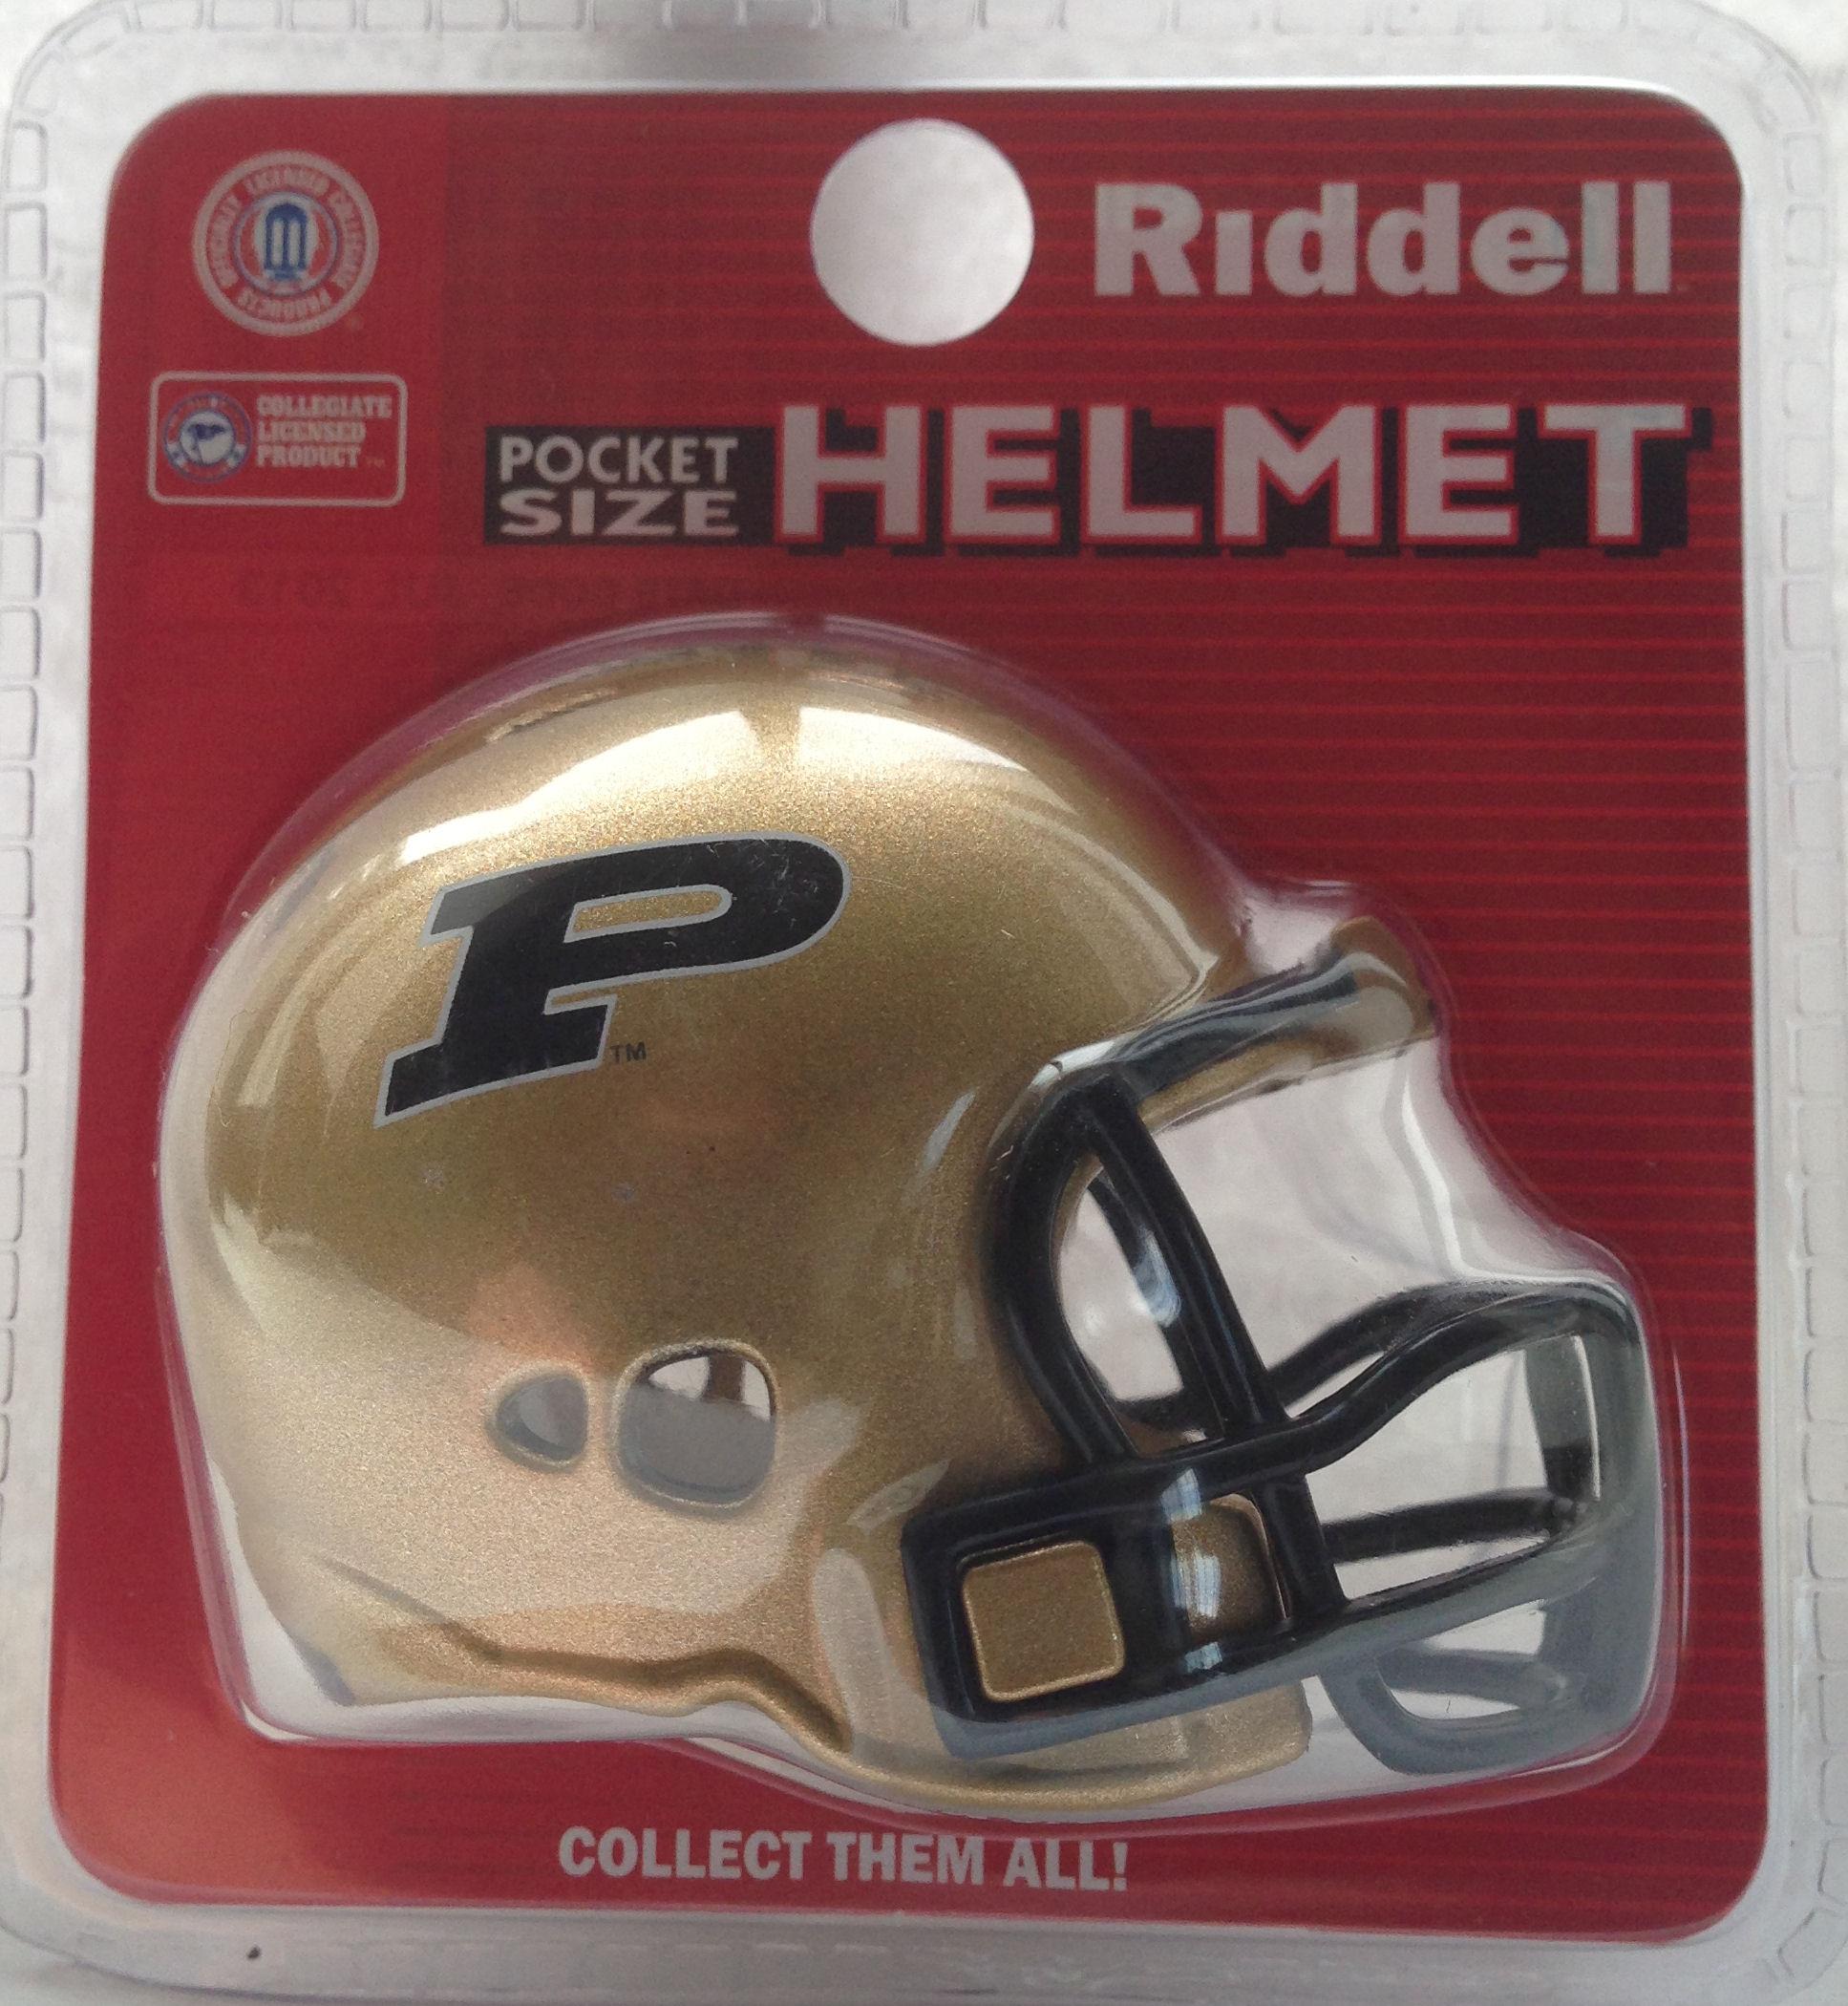 Purdue Boilermakers Pocket Pro Riddell